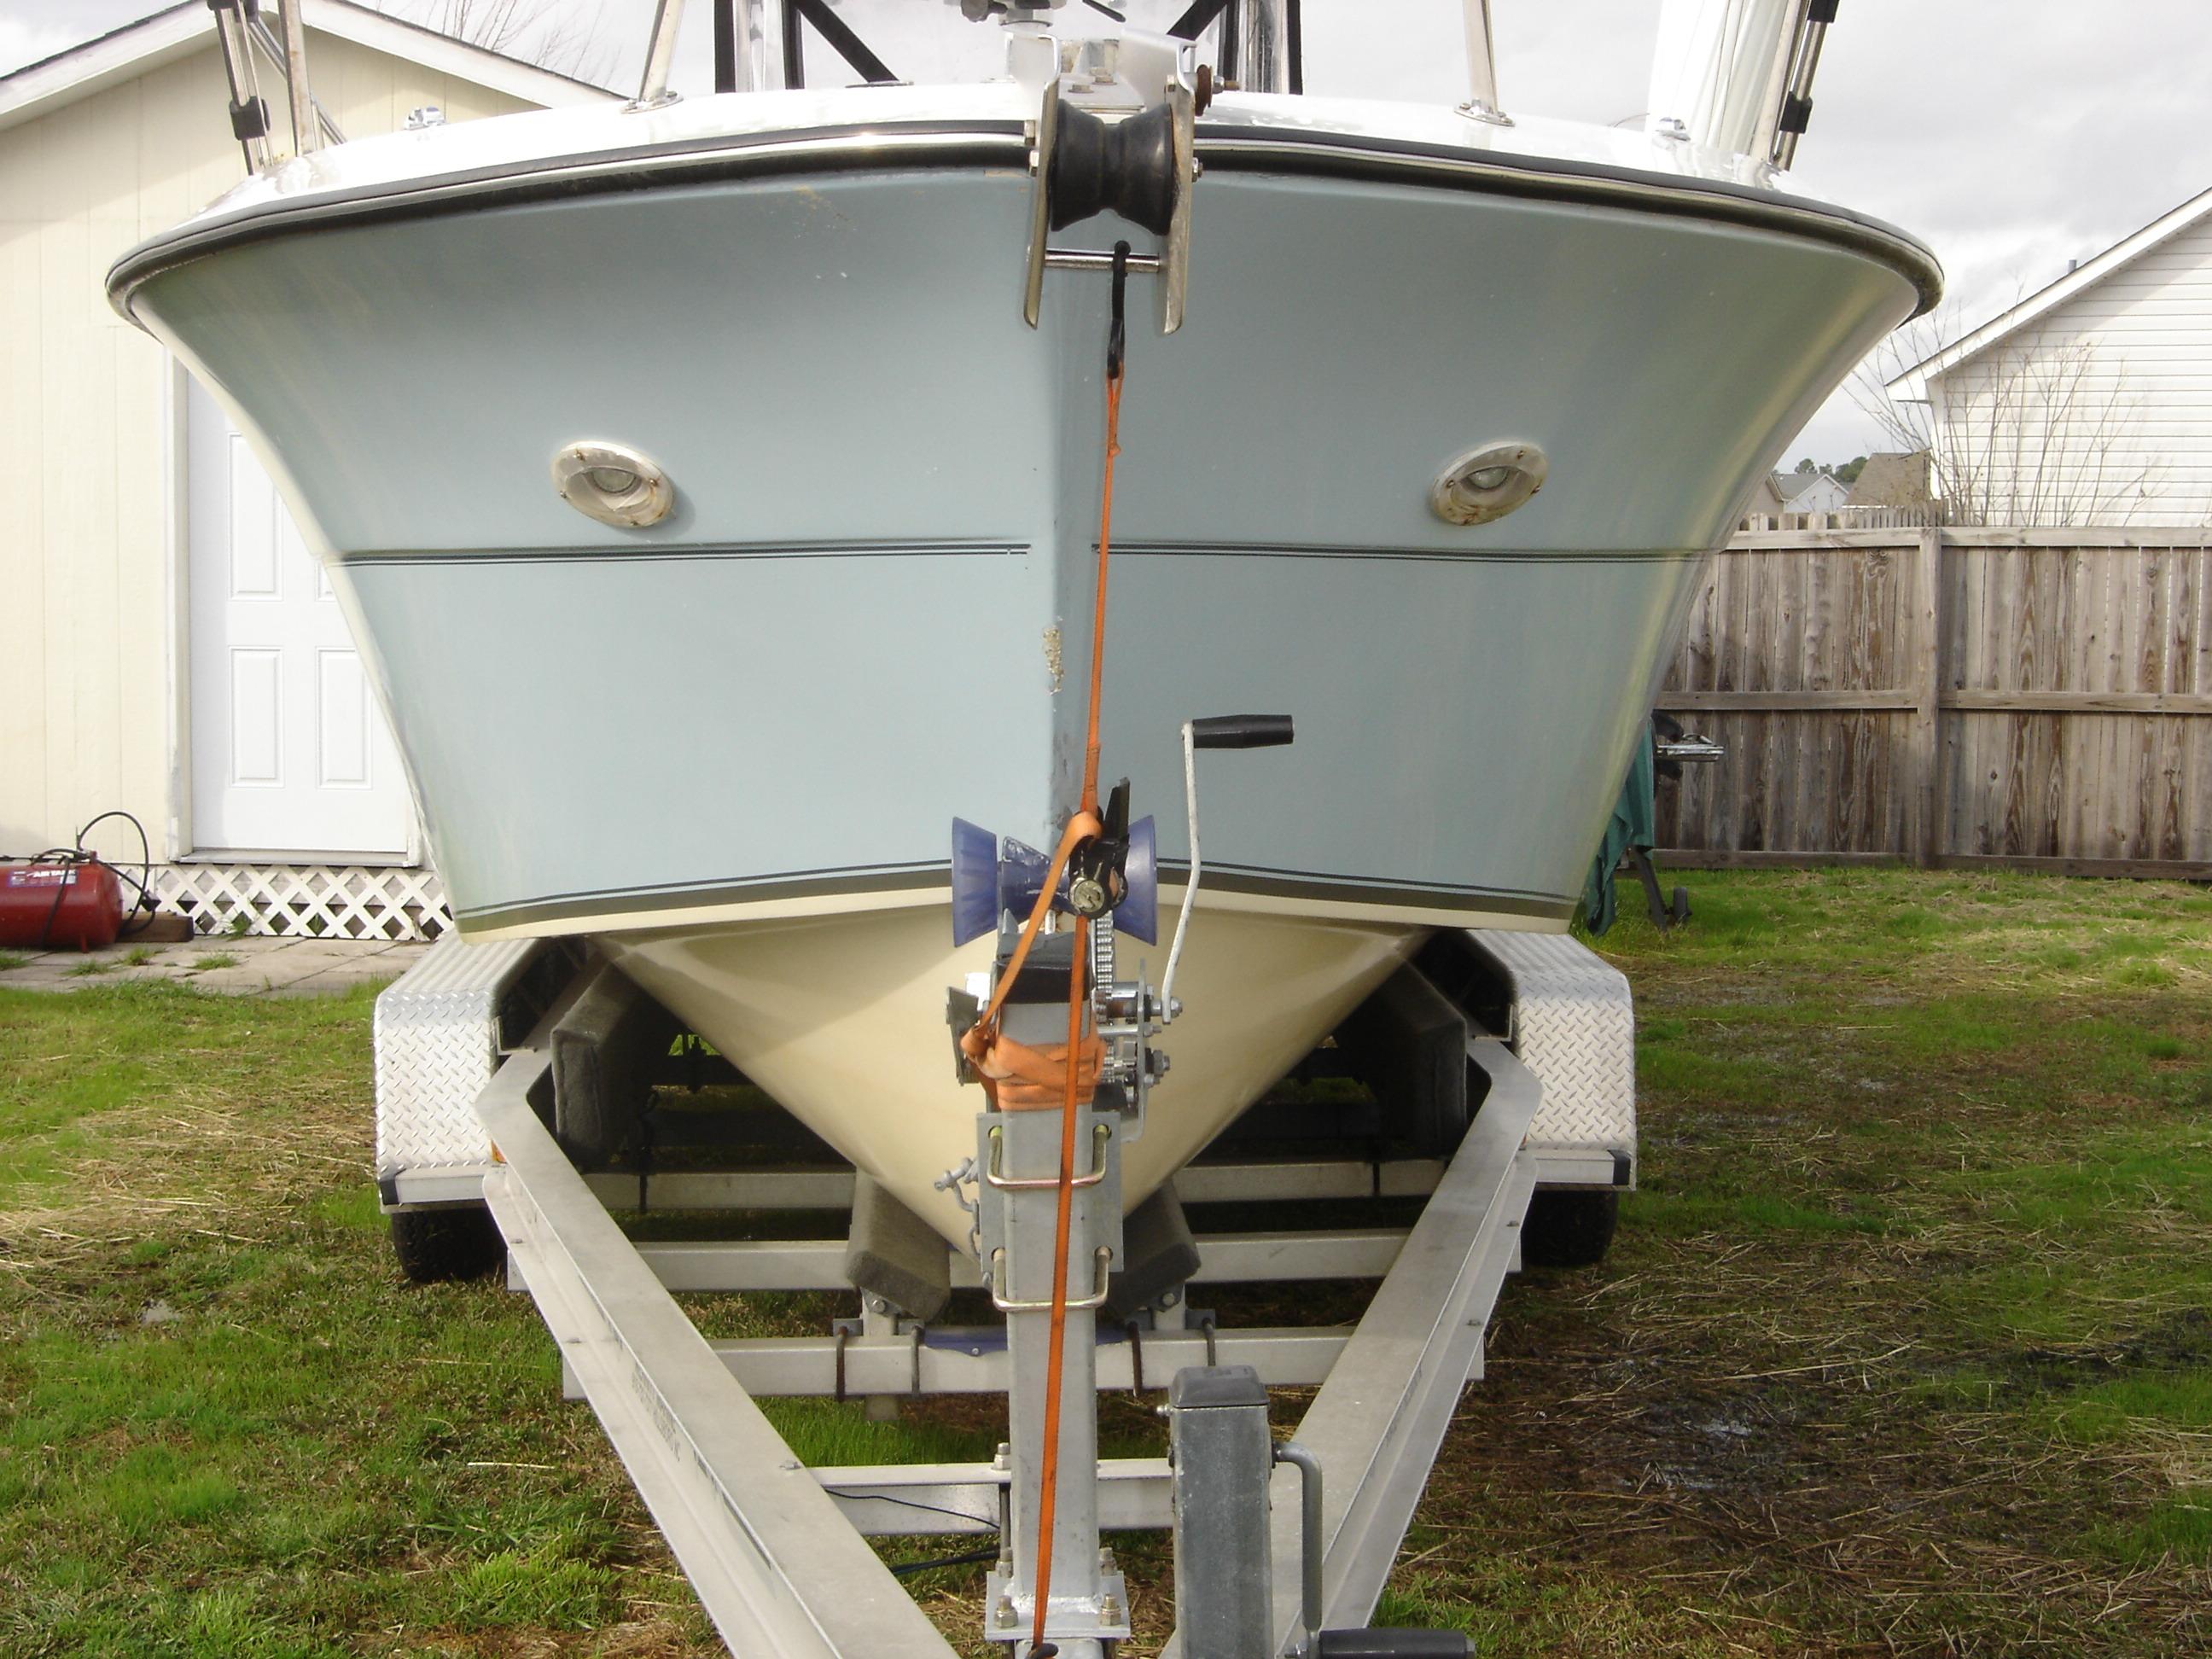 Porpoise/Possible Trim Tab Problem | Boat Design Net